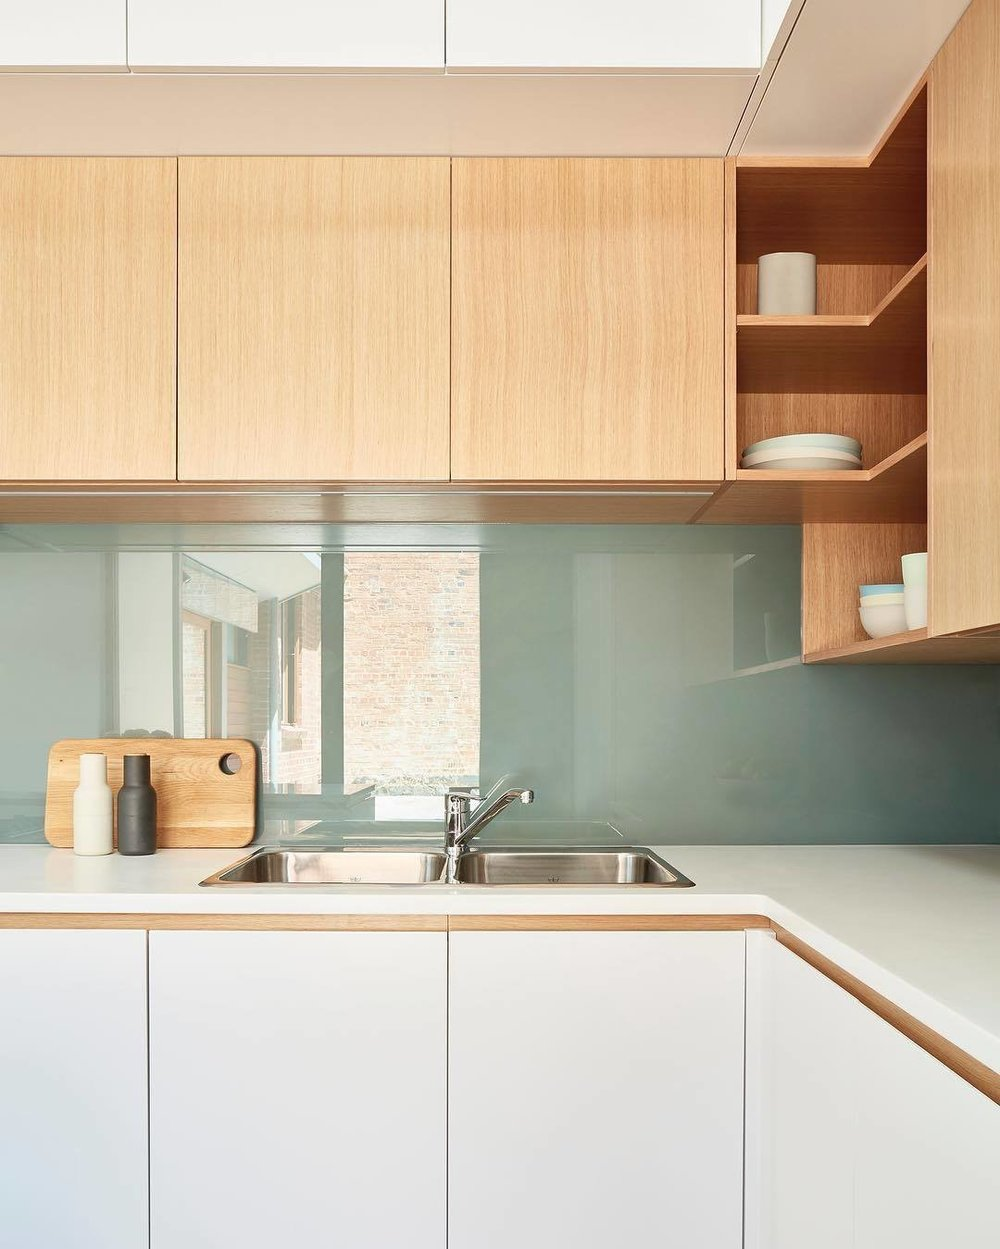 Connect Parkville House kitchen. (Courtesy of Steffen Welsch Architects)